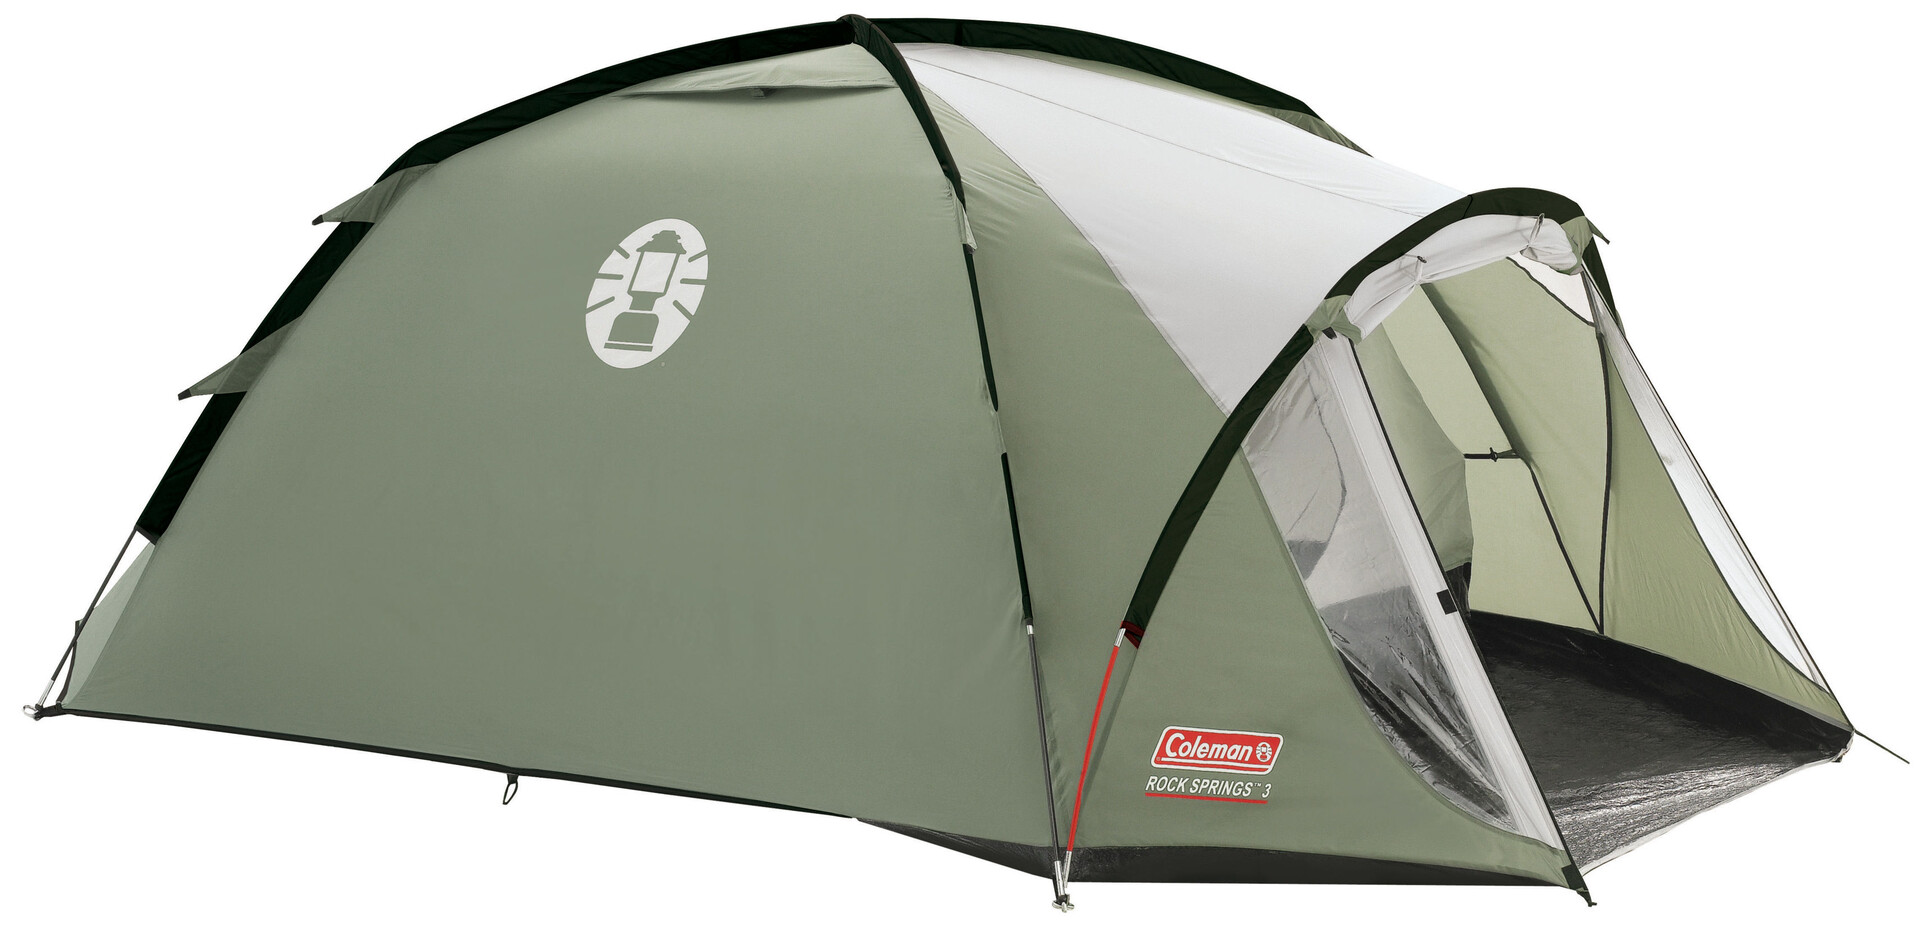 Coleman Rock Springs 4 Tent l Online outdoor shop Campz.nl